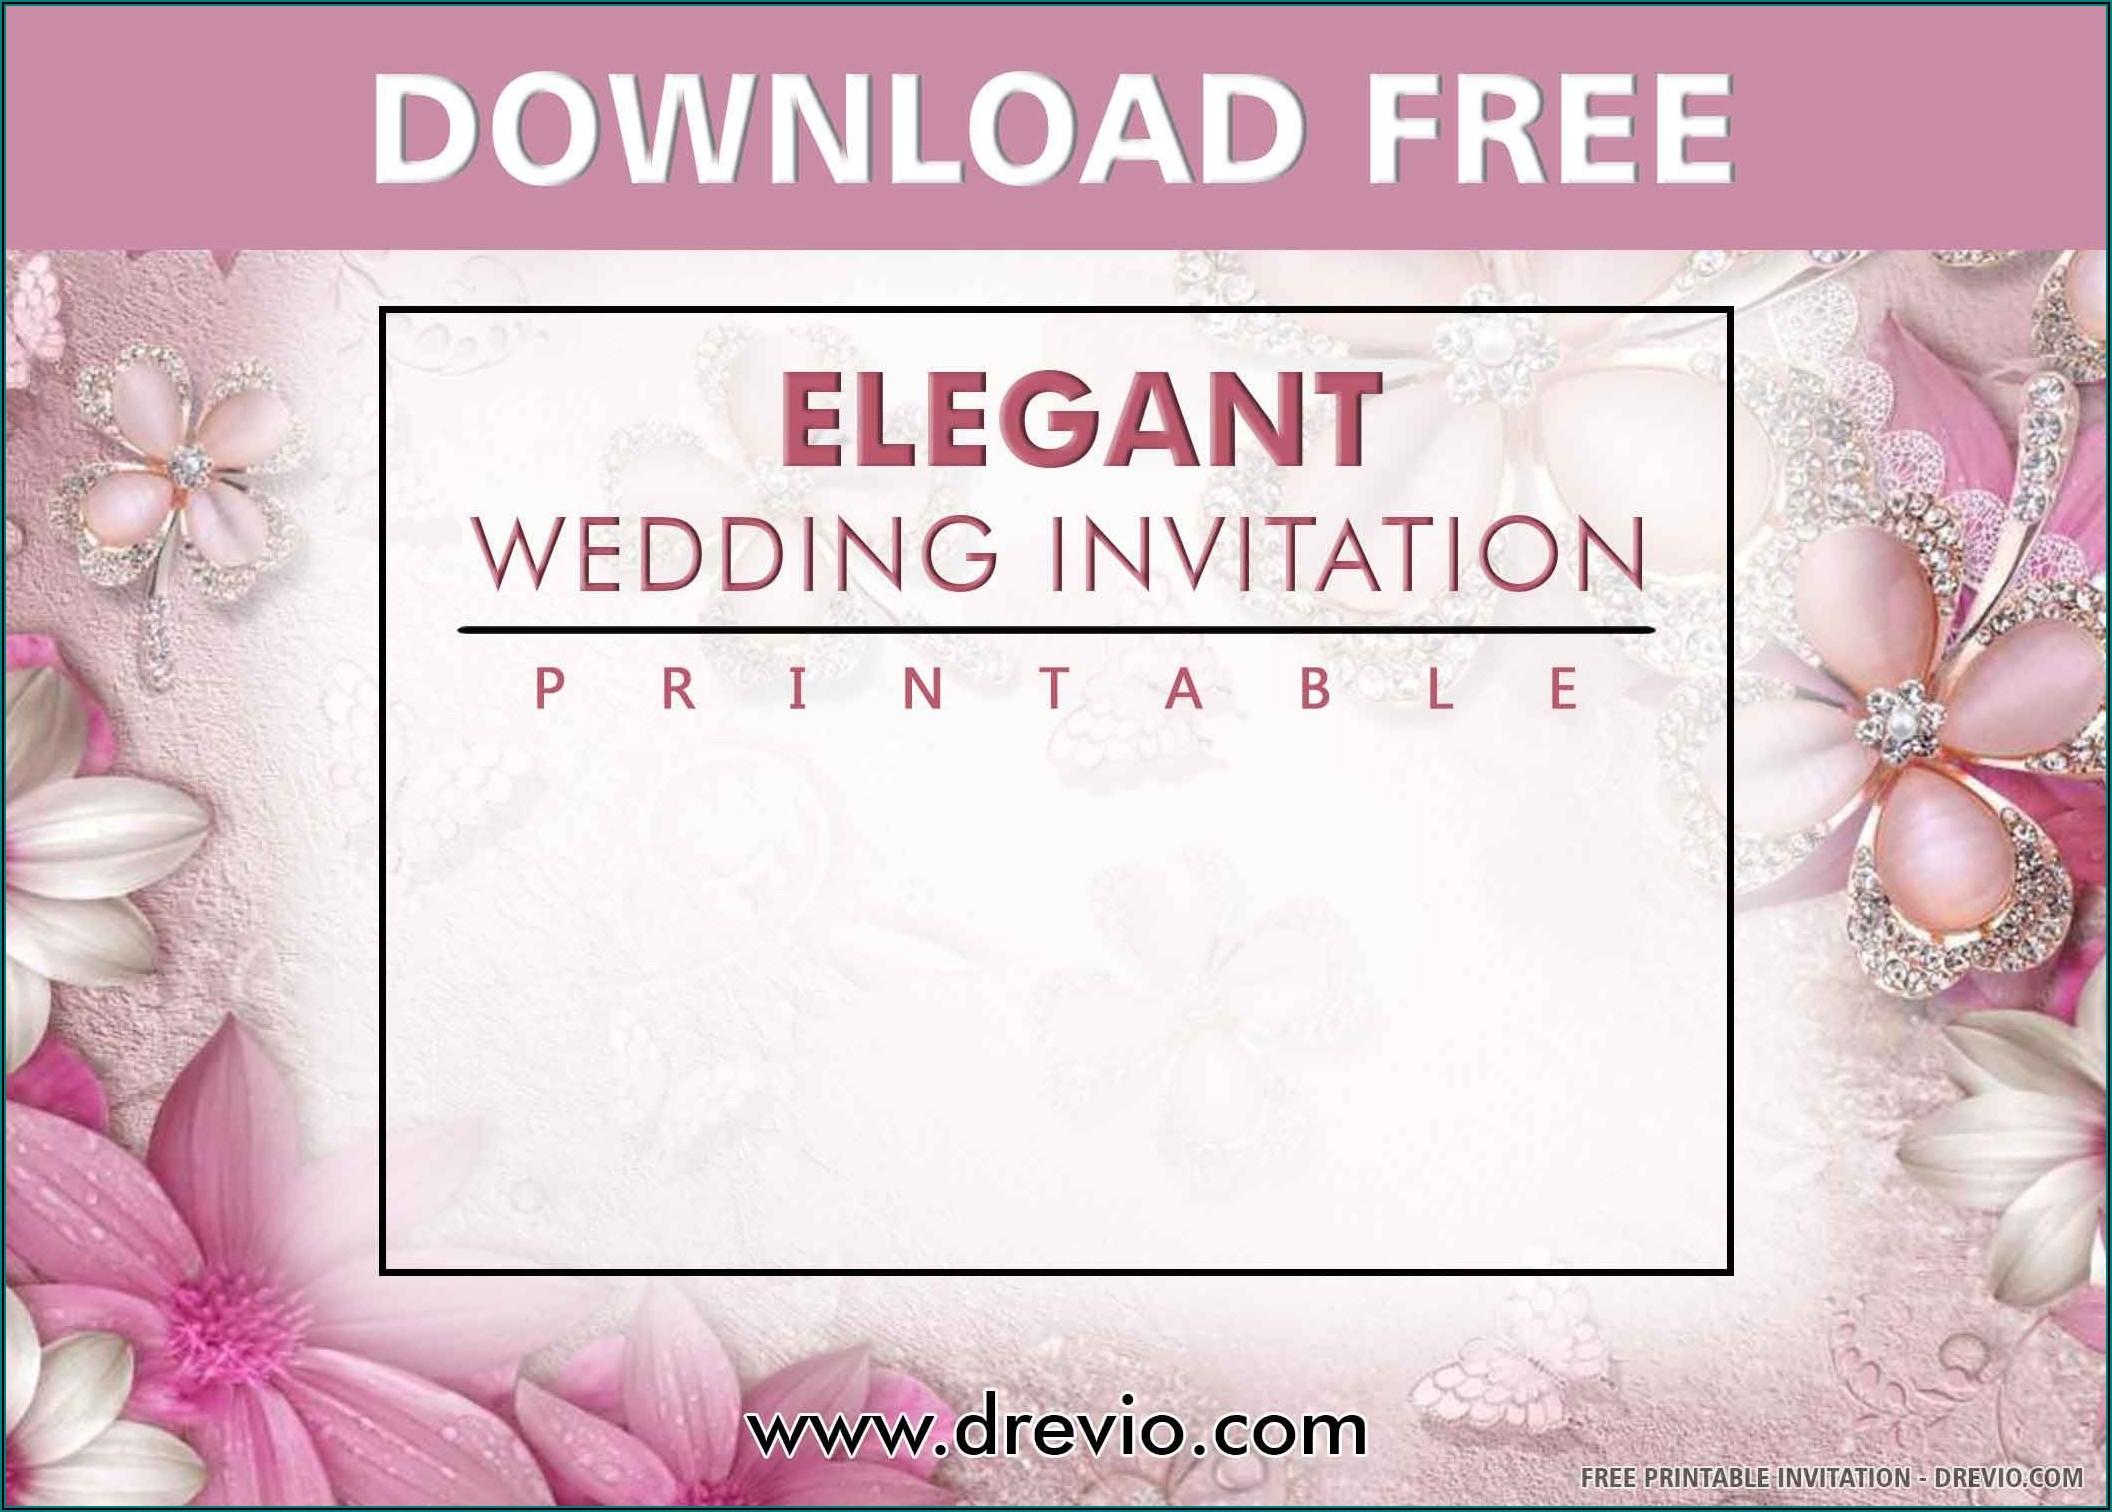 Elegant Wedding Invitations Templates Free